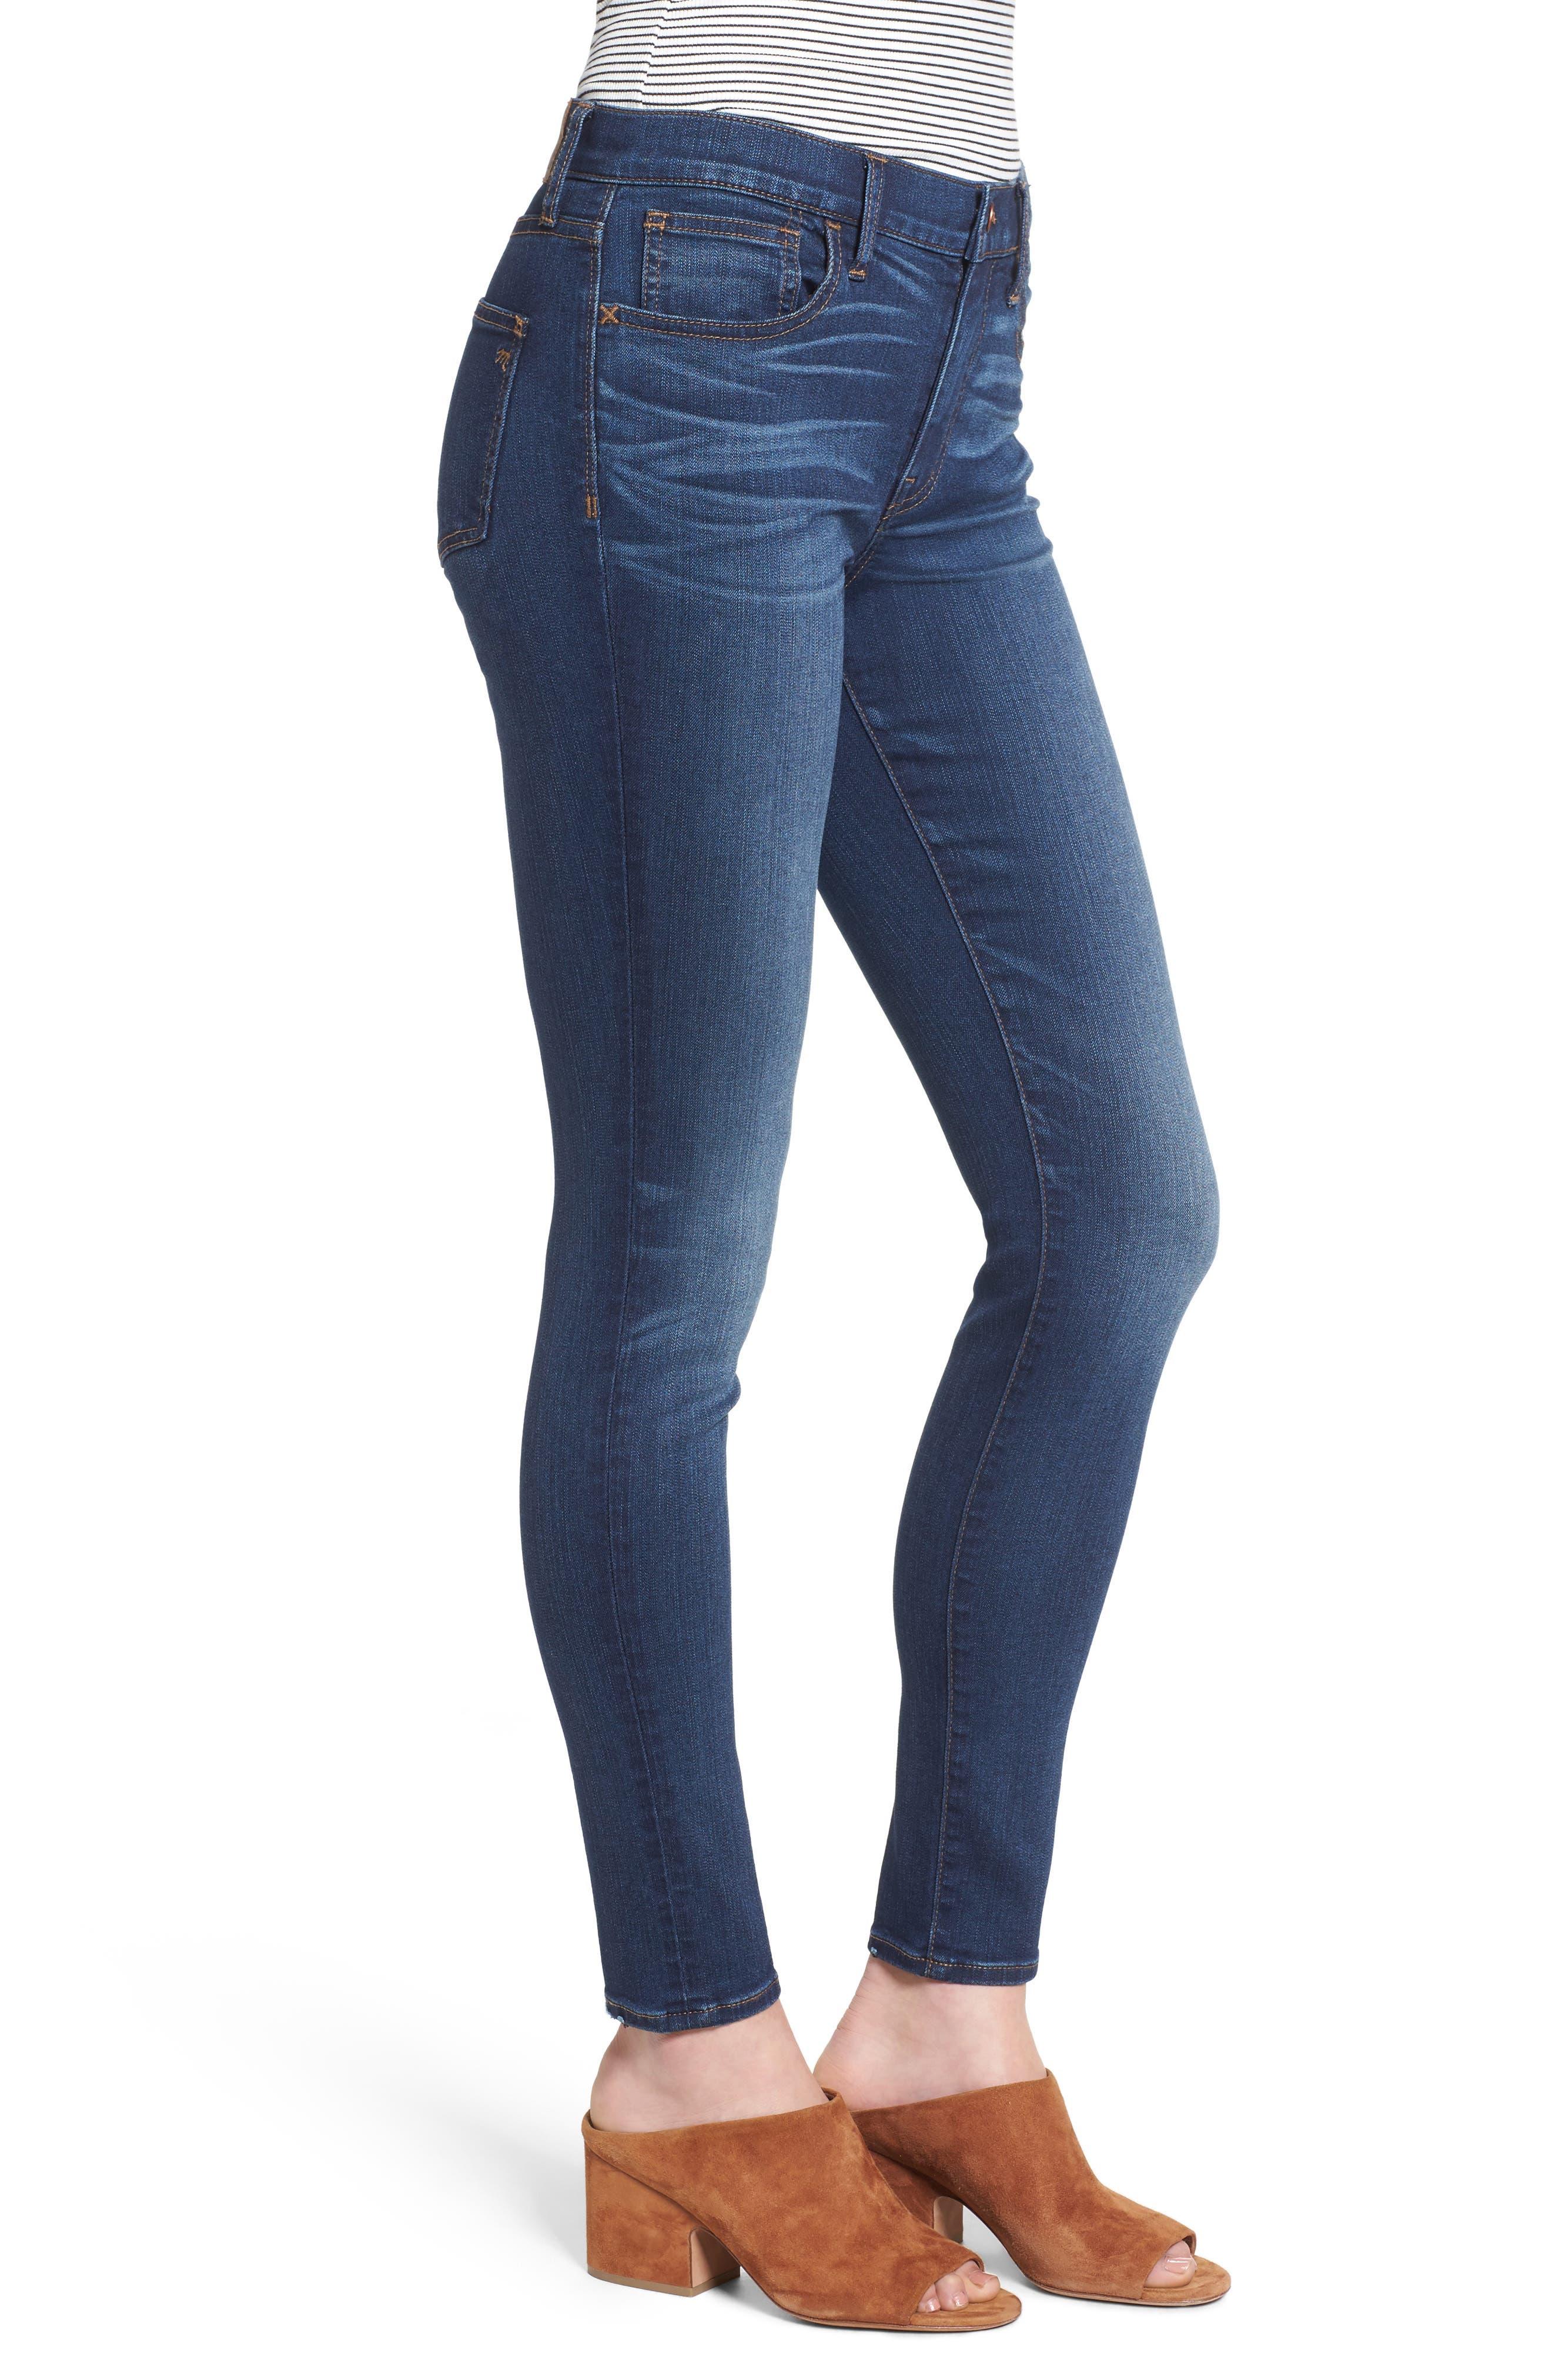 Alternate Image 3  - Madewell Roadtripper Jeans (Darryl Wash)